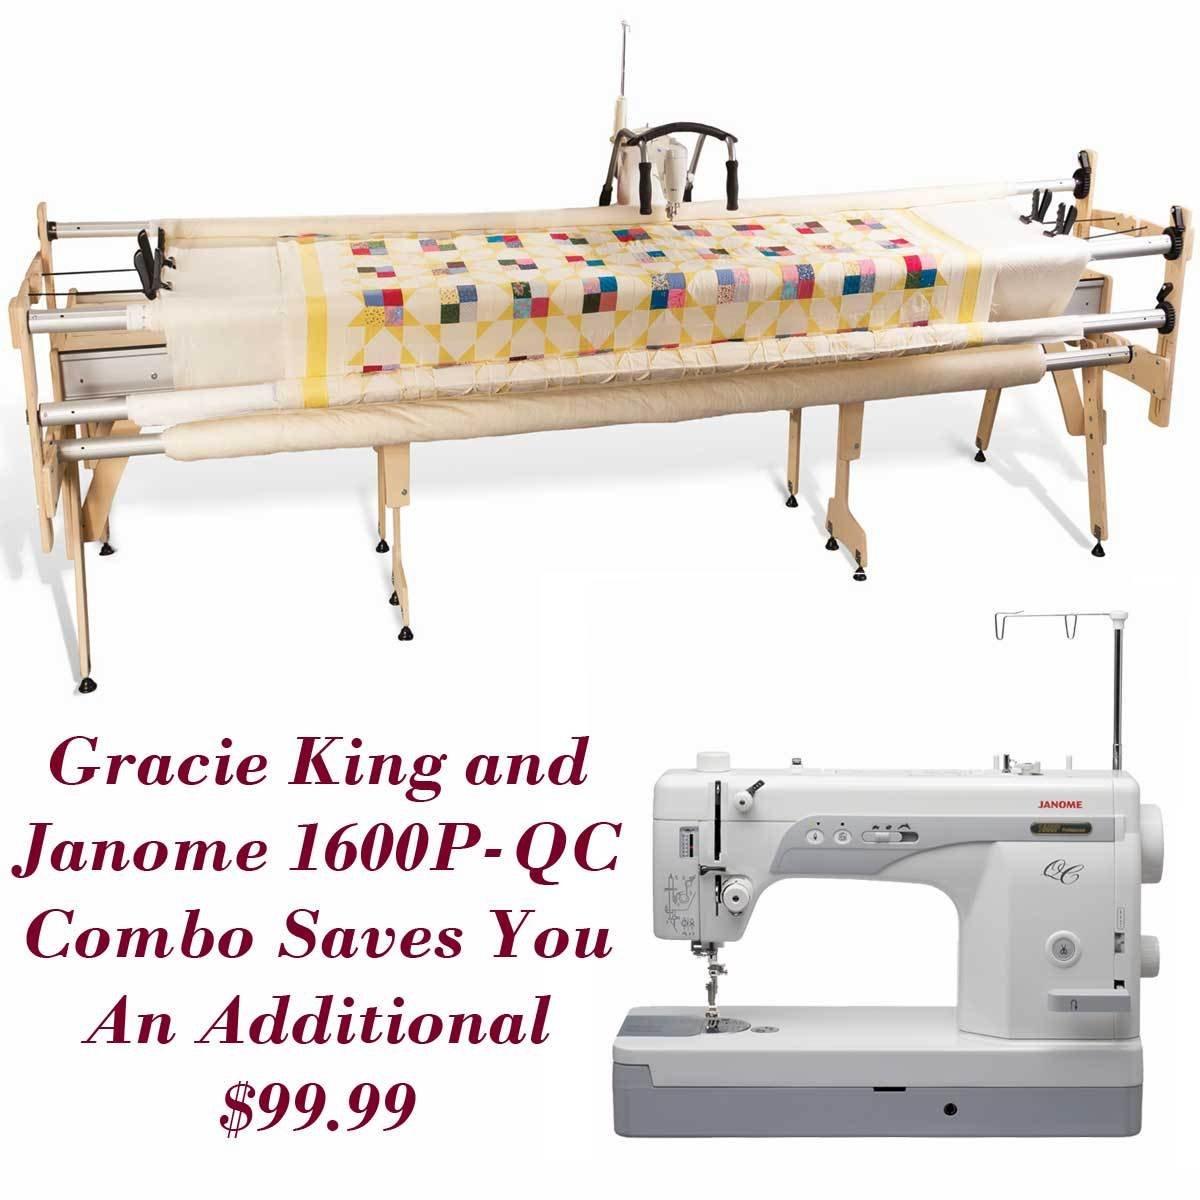 Amazon.com: Janome 1600P-QC and Grace Gracie King Machine Quilter ... : proflex quilting frame - Adamdwight.com